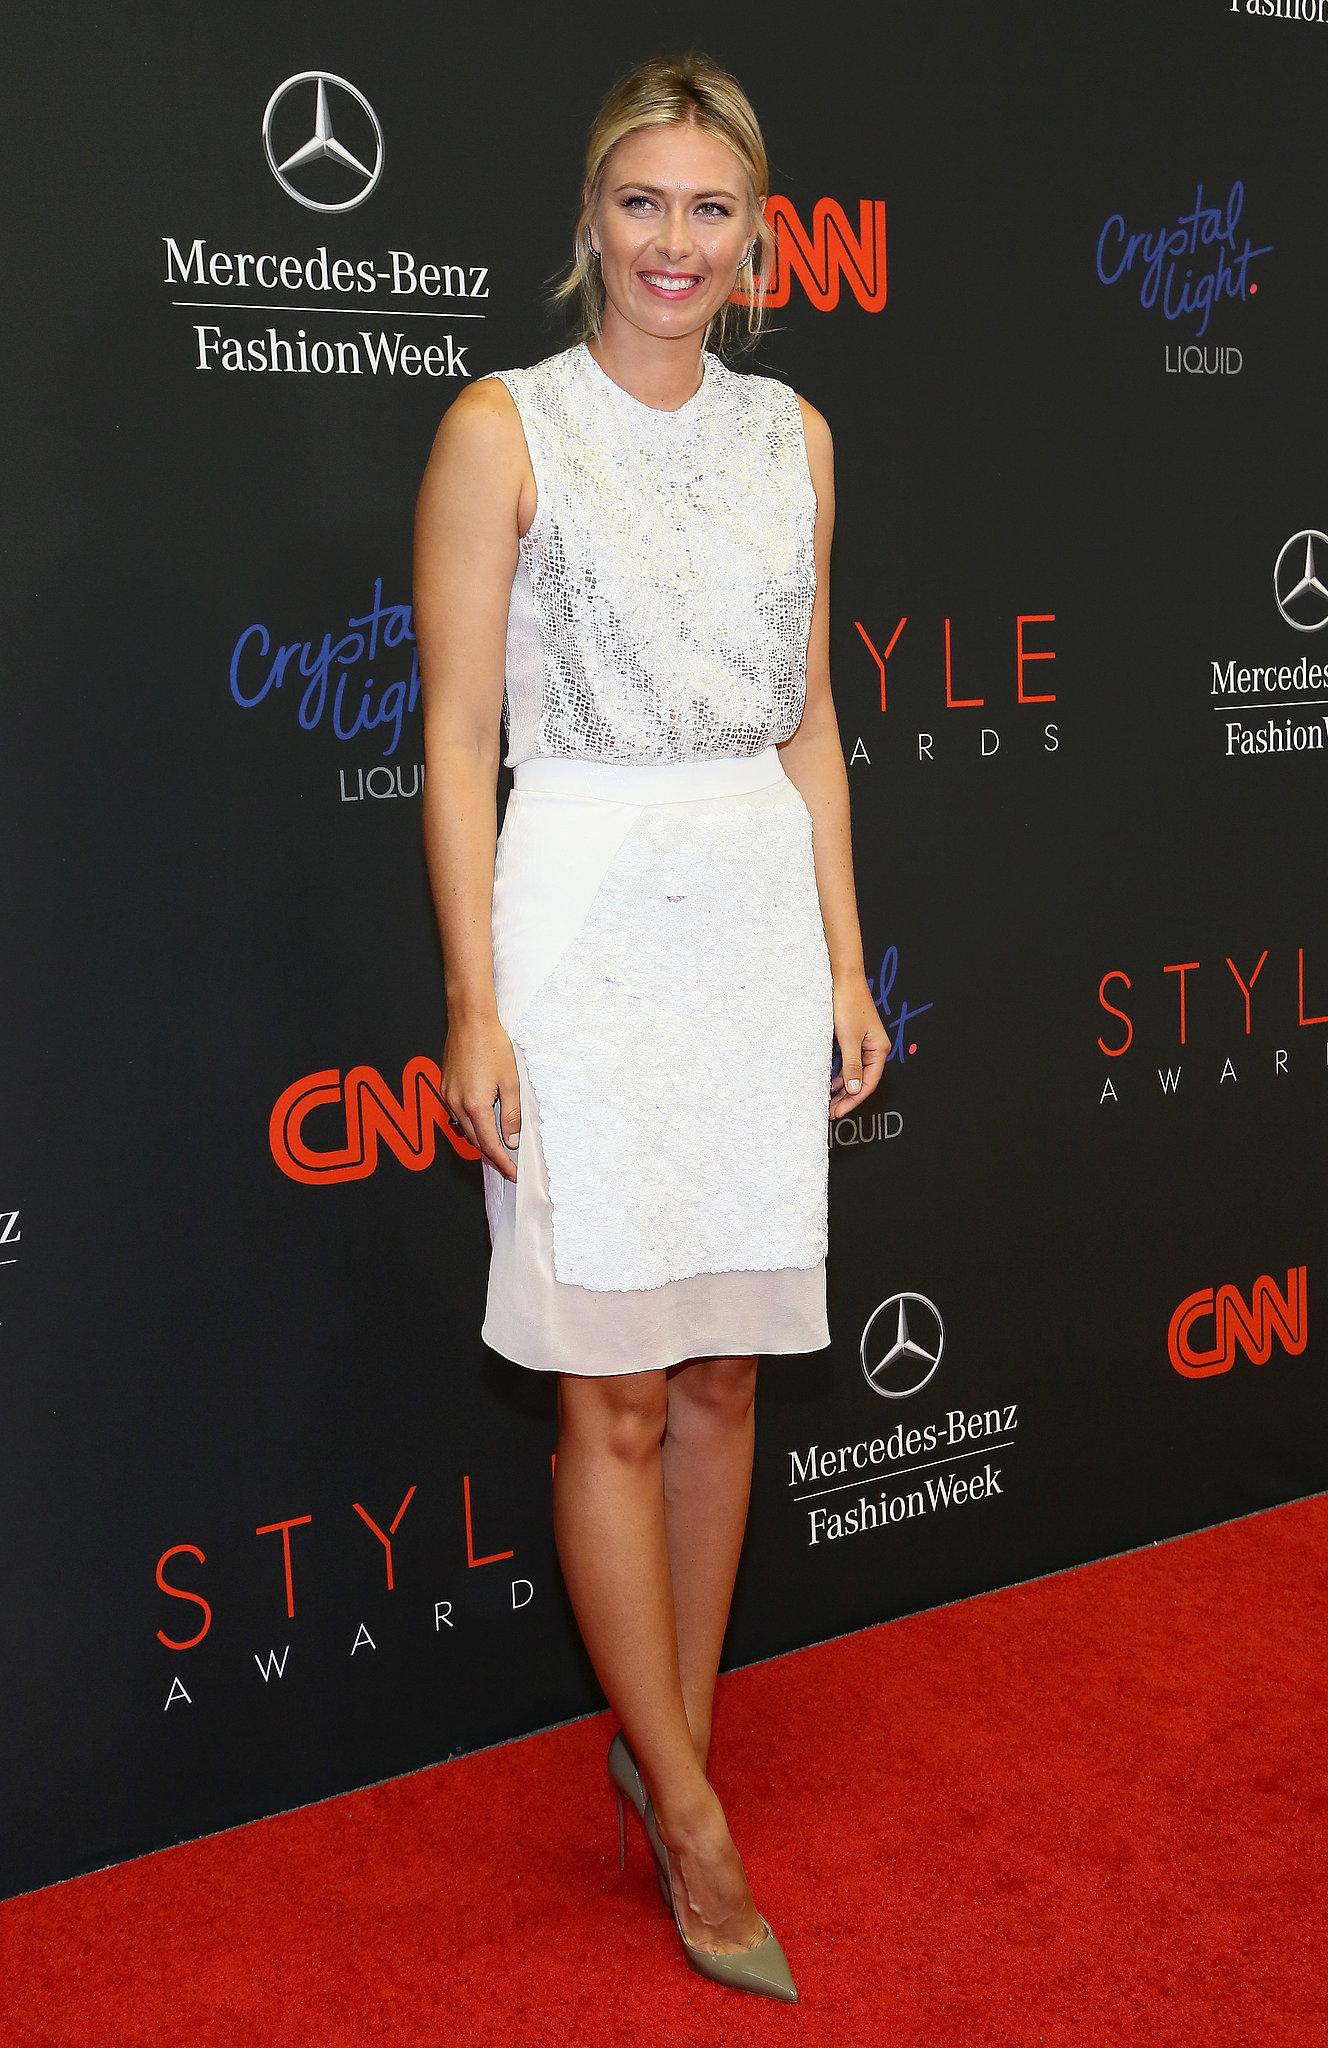 Nicole Richie, Rachel Zoe, and Kate Upton Kick Off Fashion Week